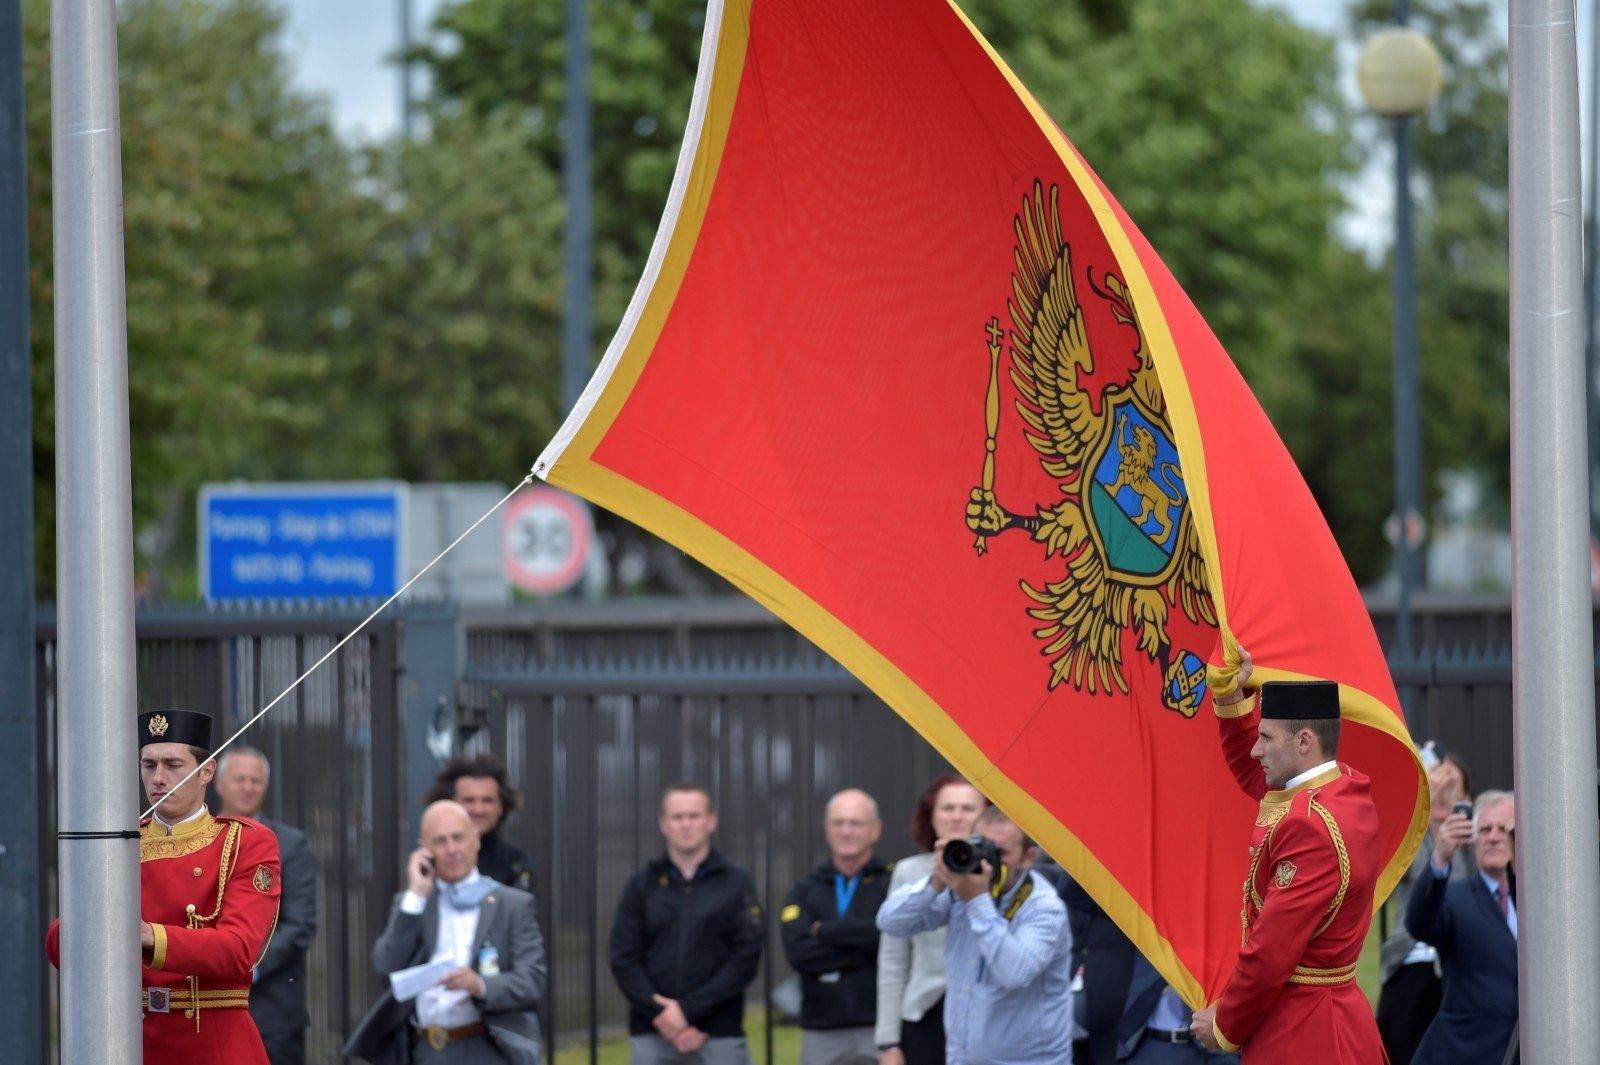 juodkalnija istojo i nato 74875124 НАТО непланирует размещать военную базу вЧерногории